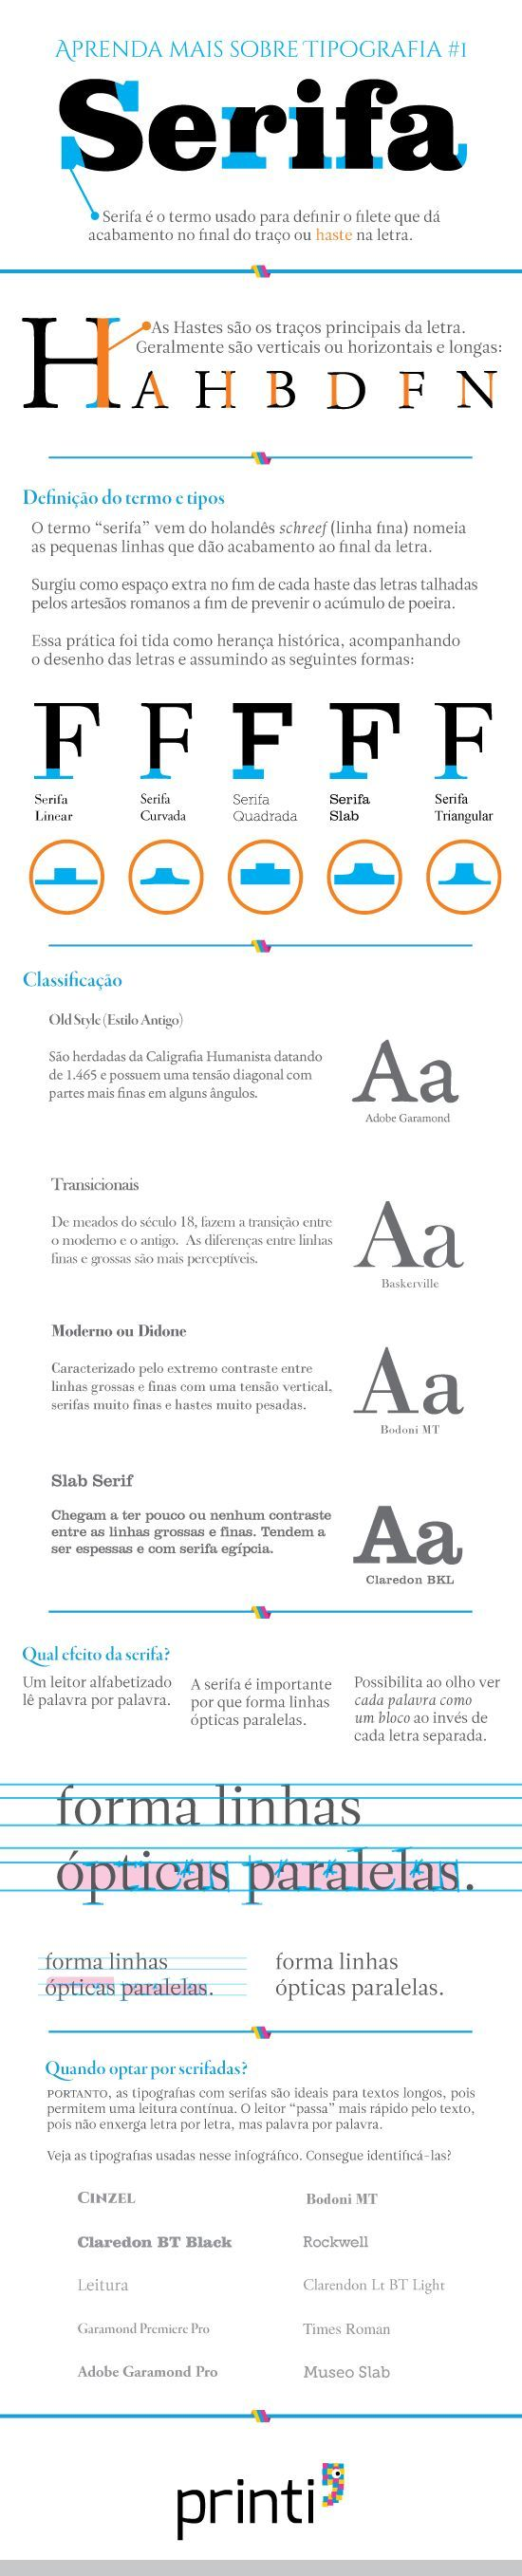 Infográfico Tipografia Serifa: